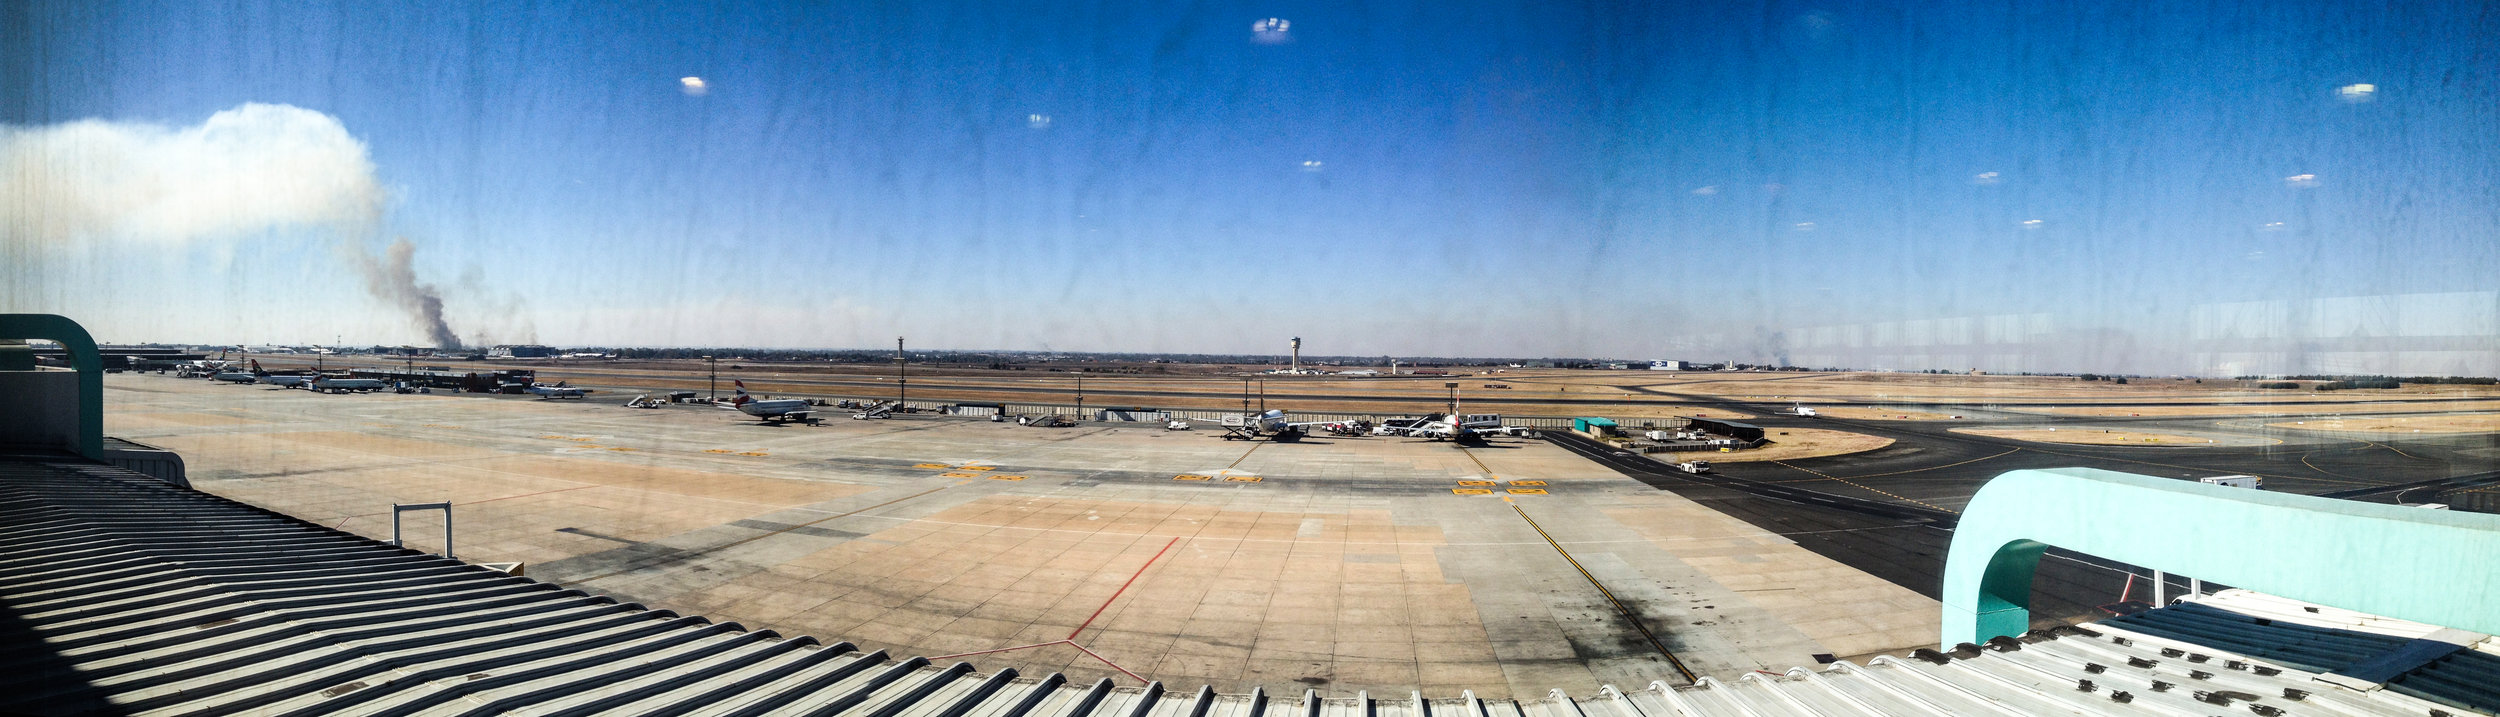 Johannesburg International Airport - South Africa